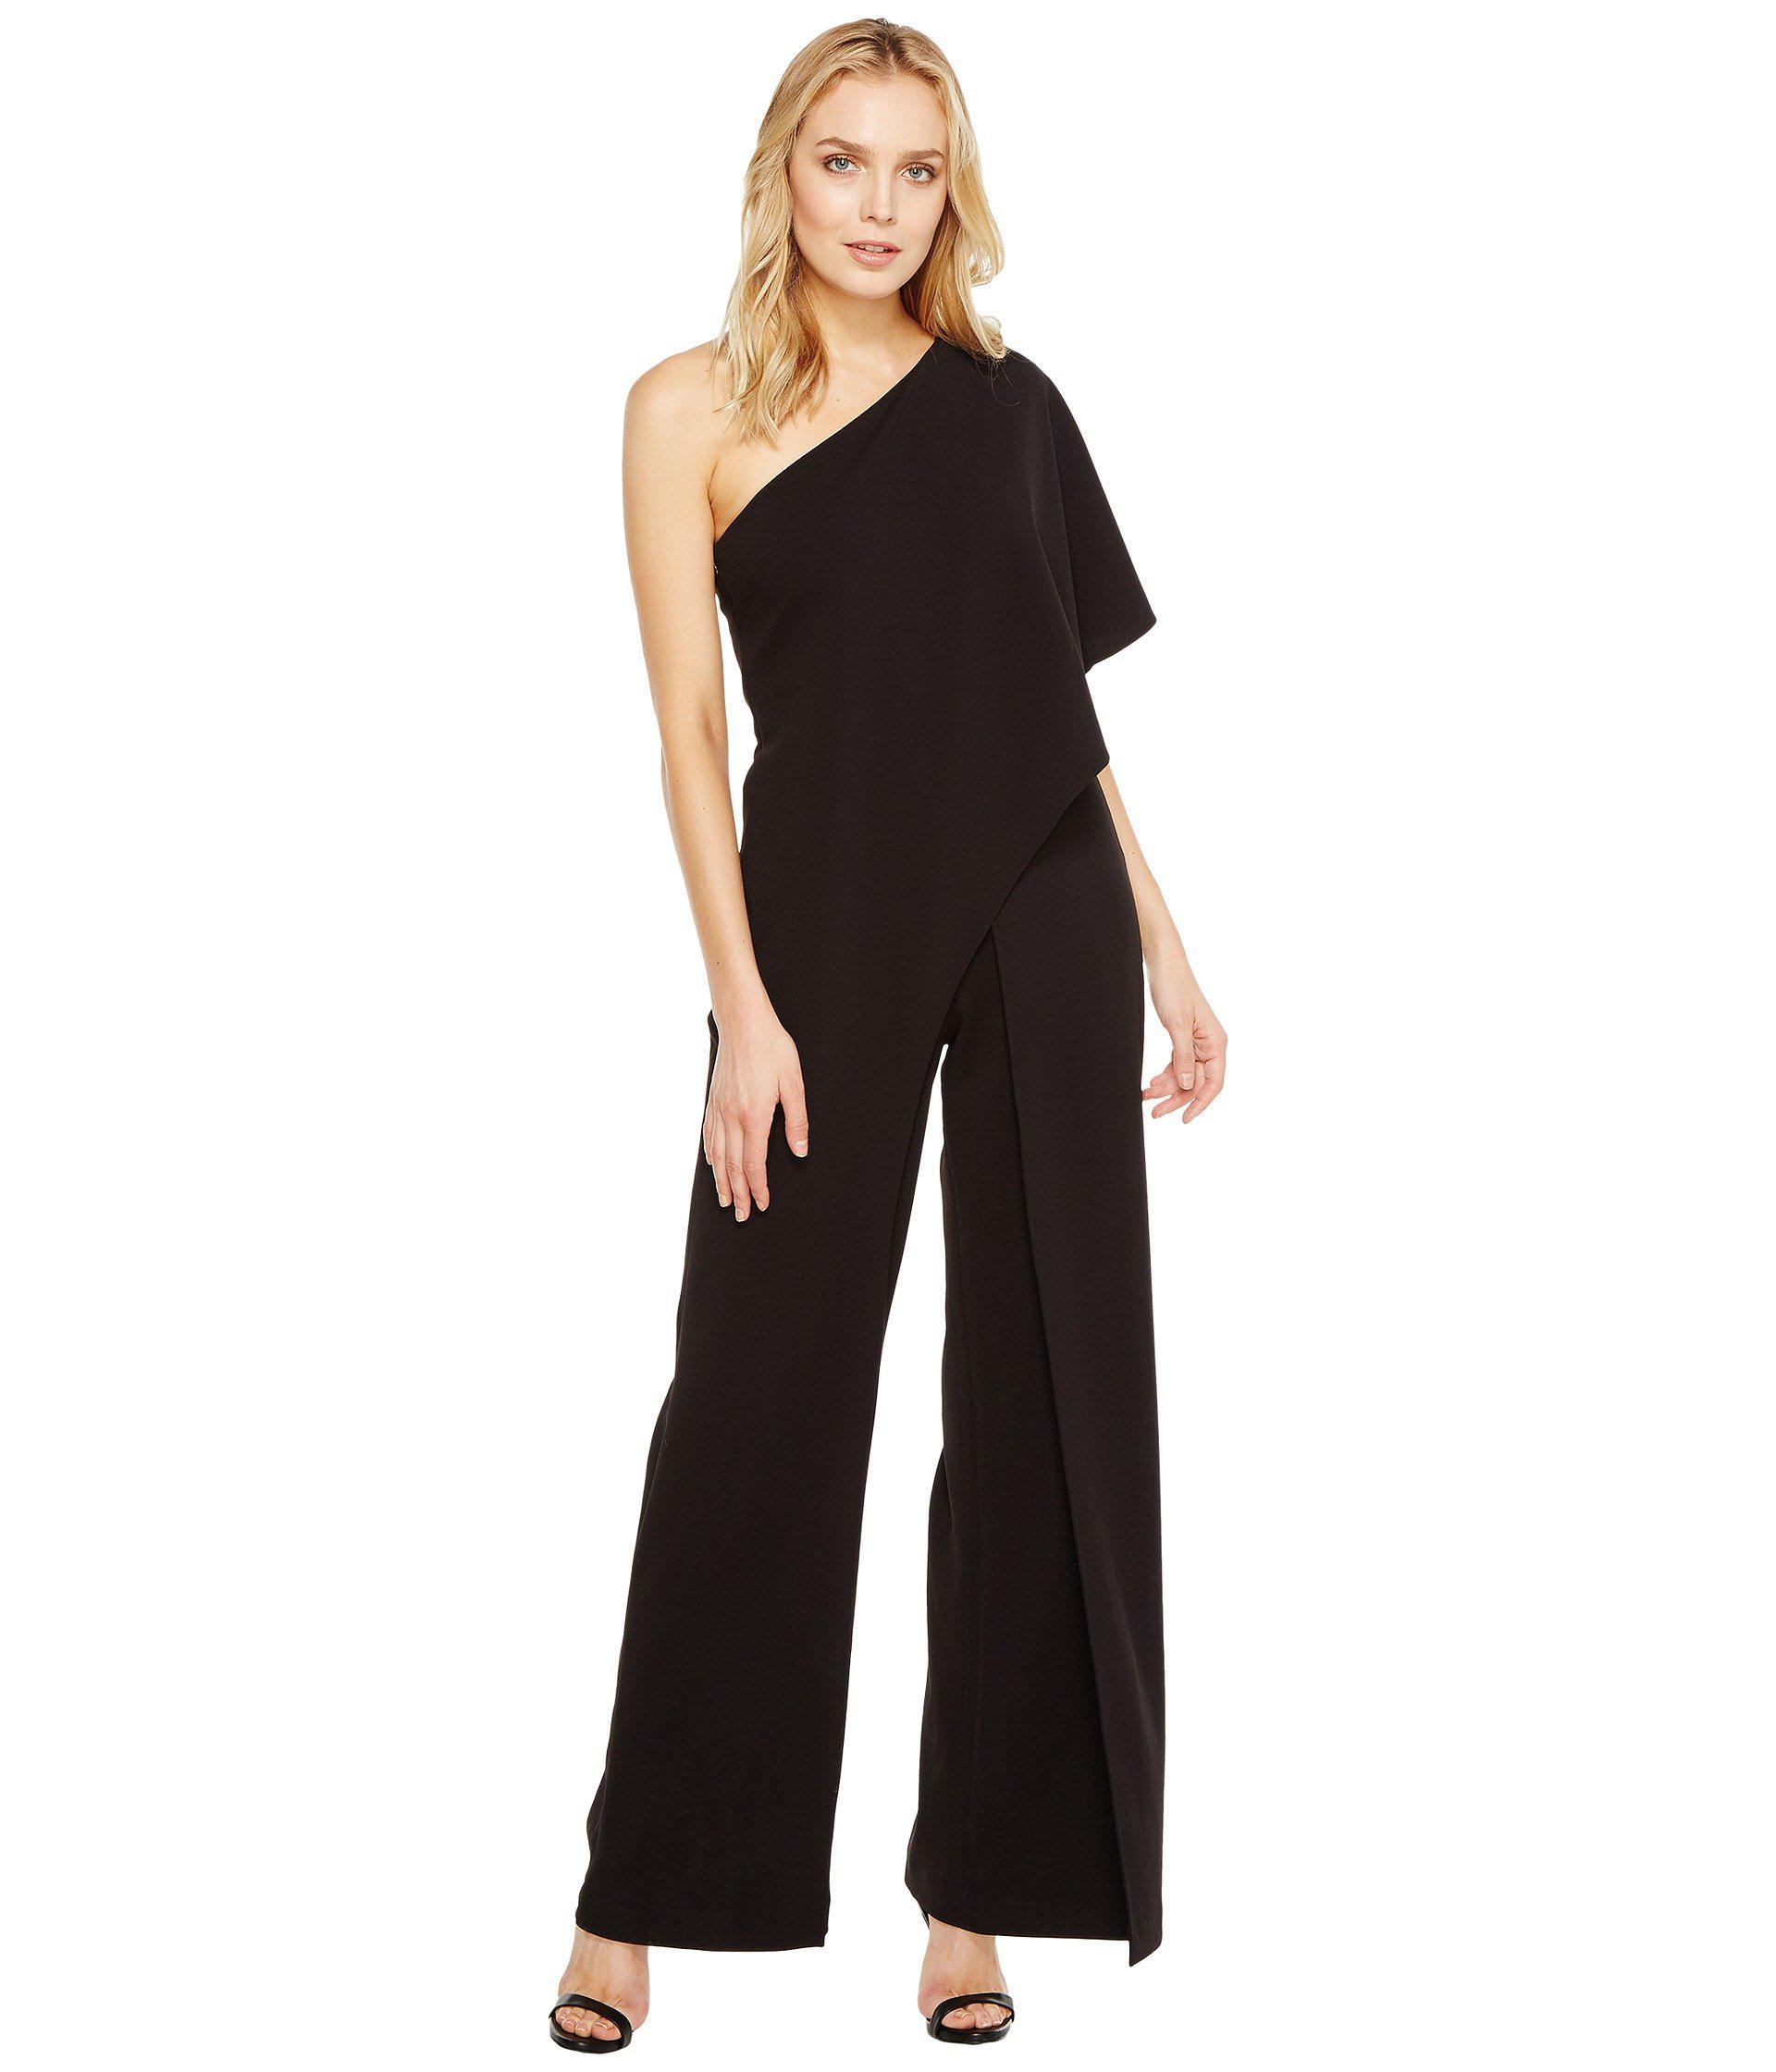 ec7955a7f01b Lyst - Adrianna Papell One Shoulder Jumpsuit (black) Women s ...